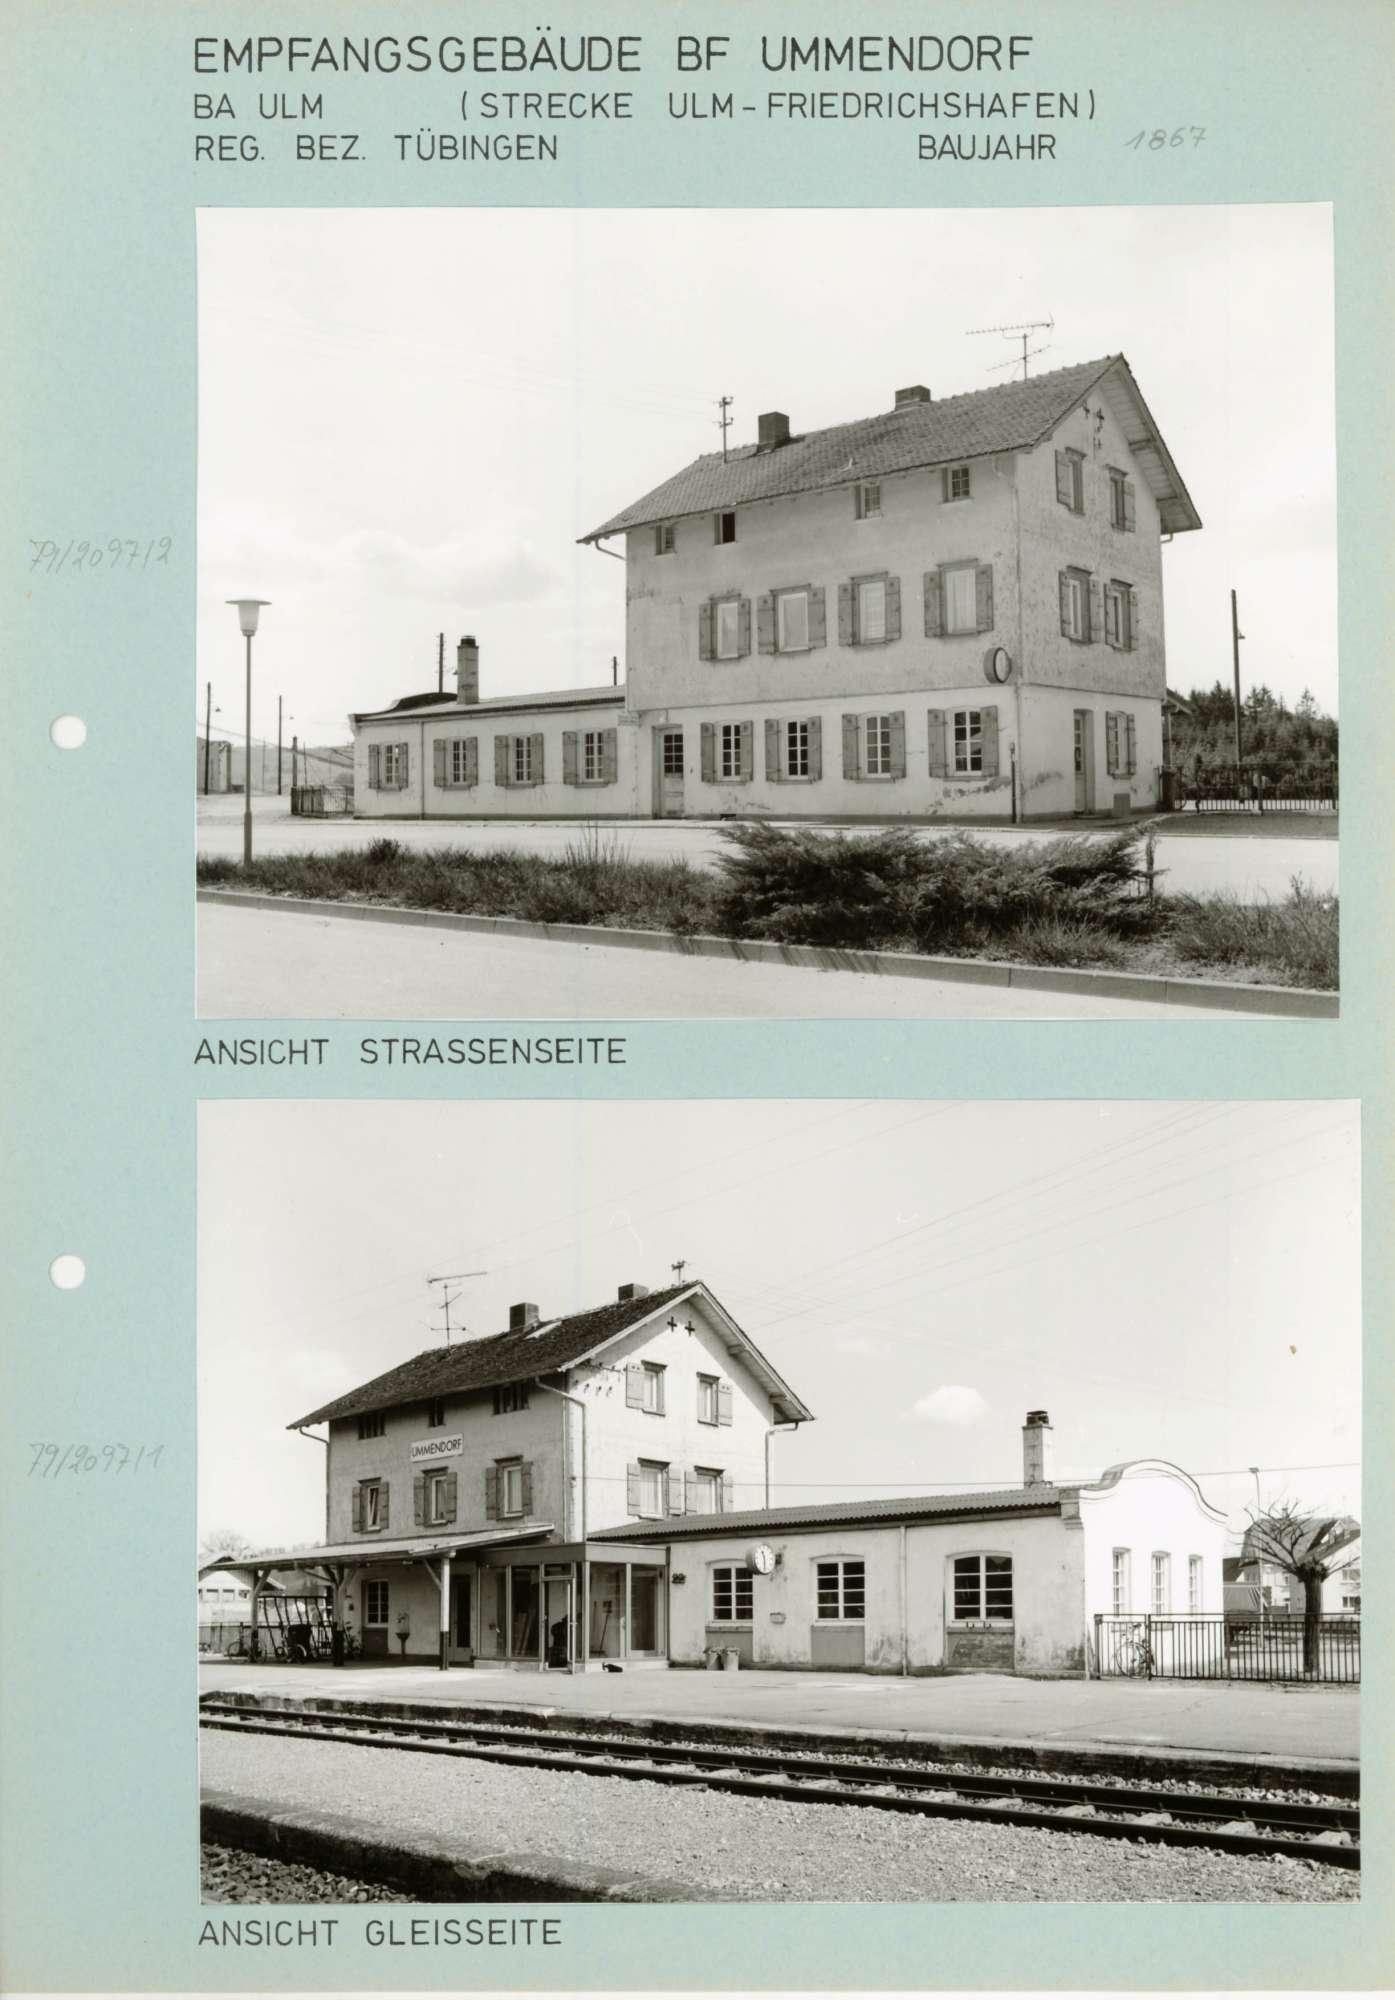 Ummendorf: 6 Fotos, Bild 3